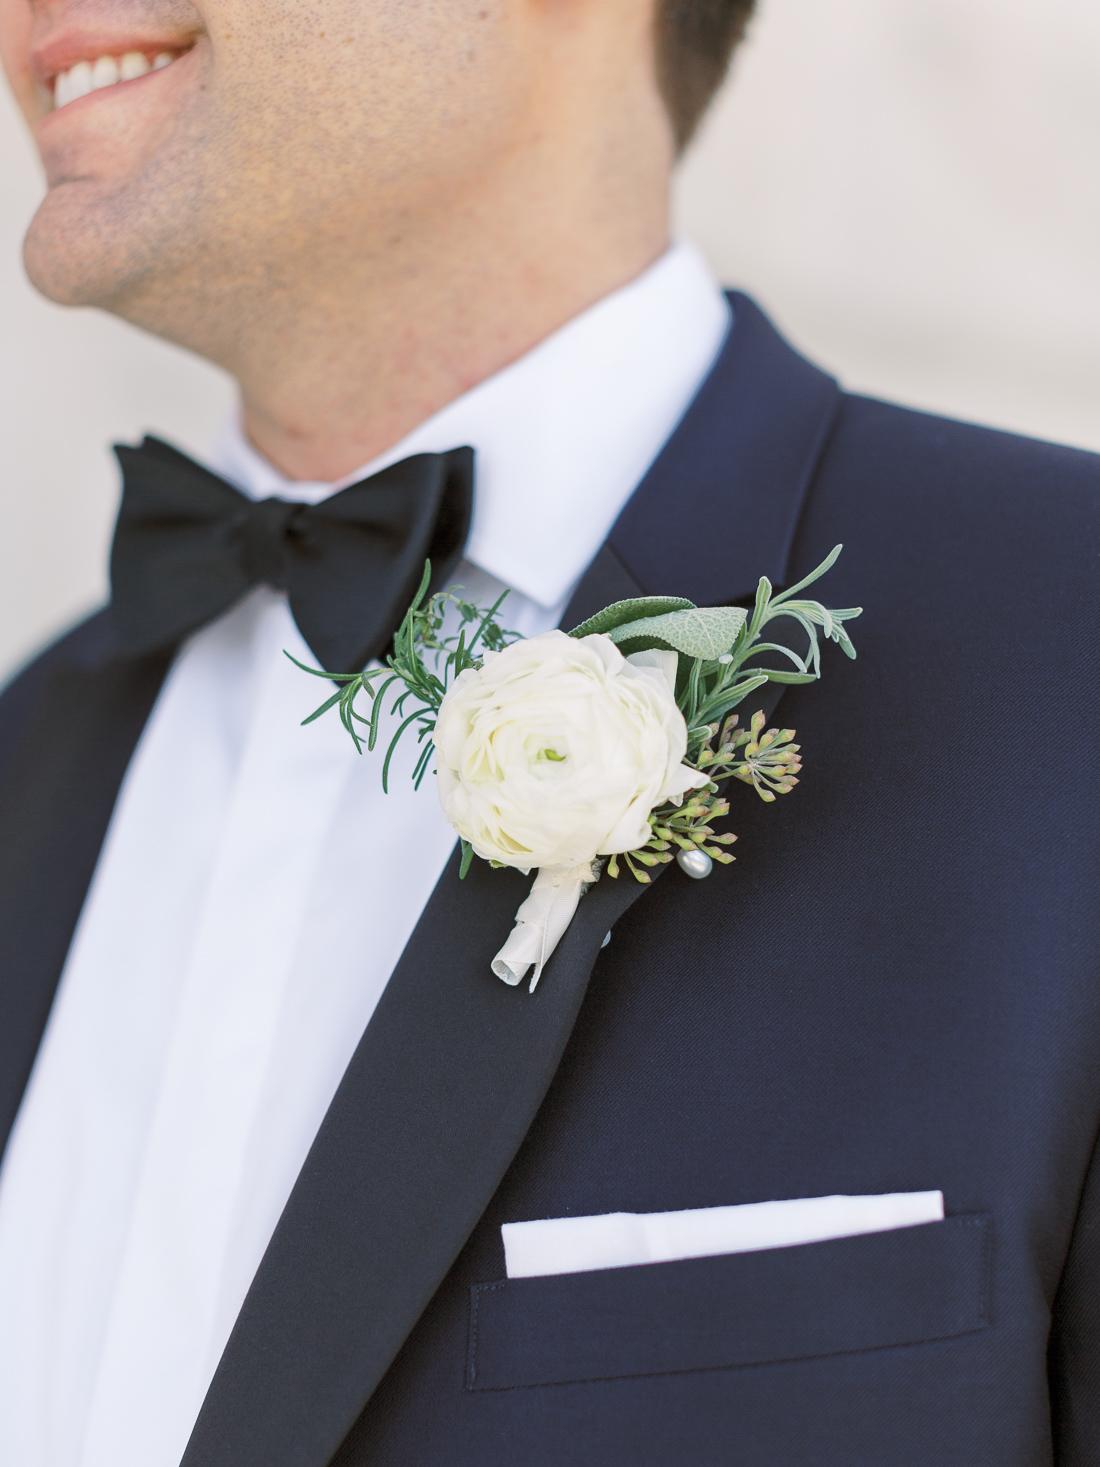 washington-dc-wedding-florist-boutonniere